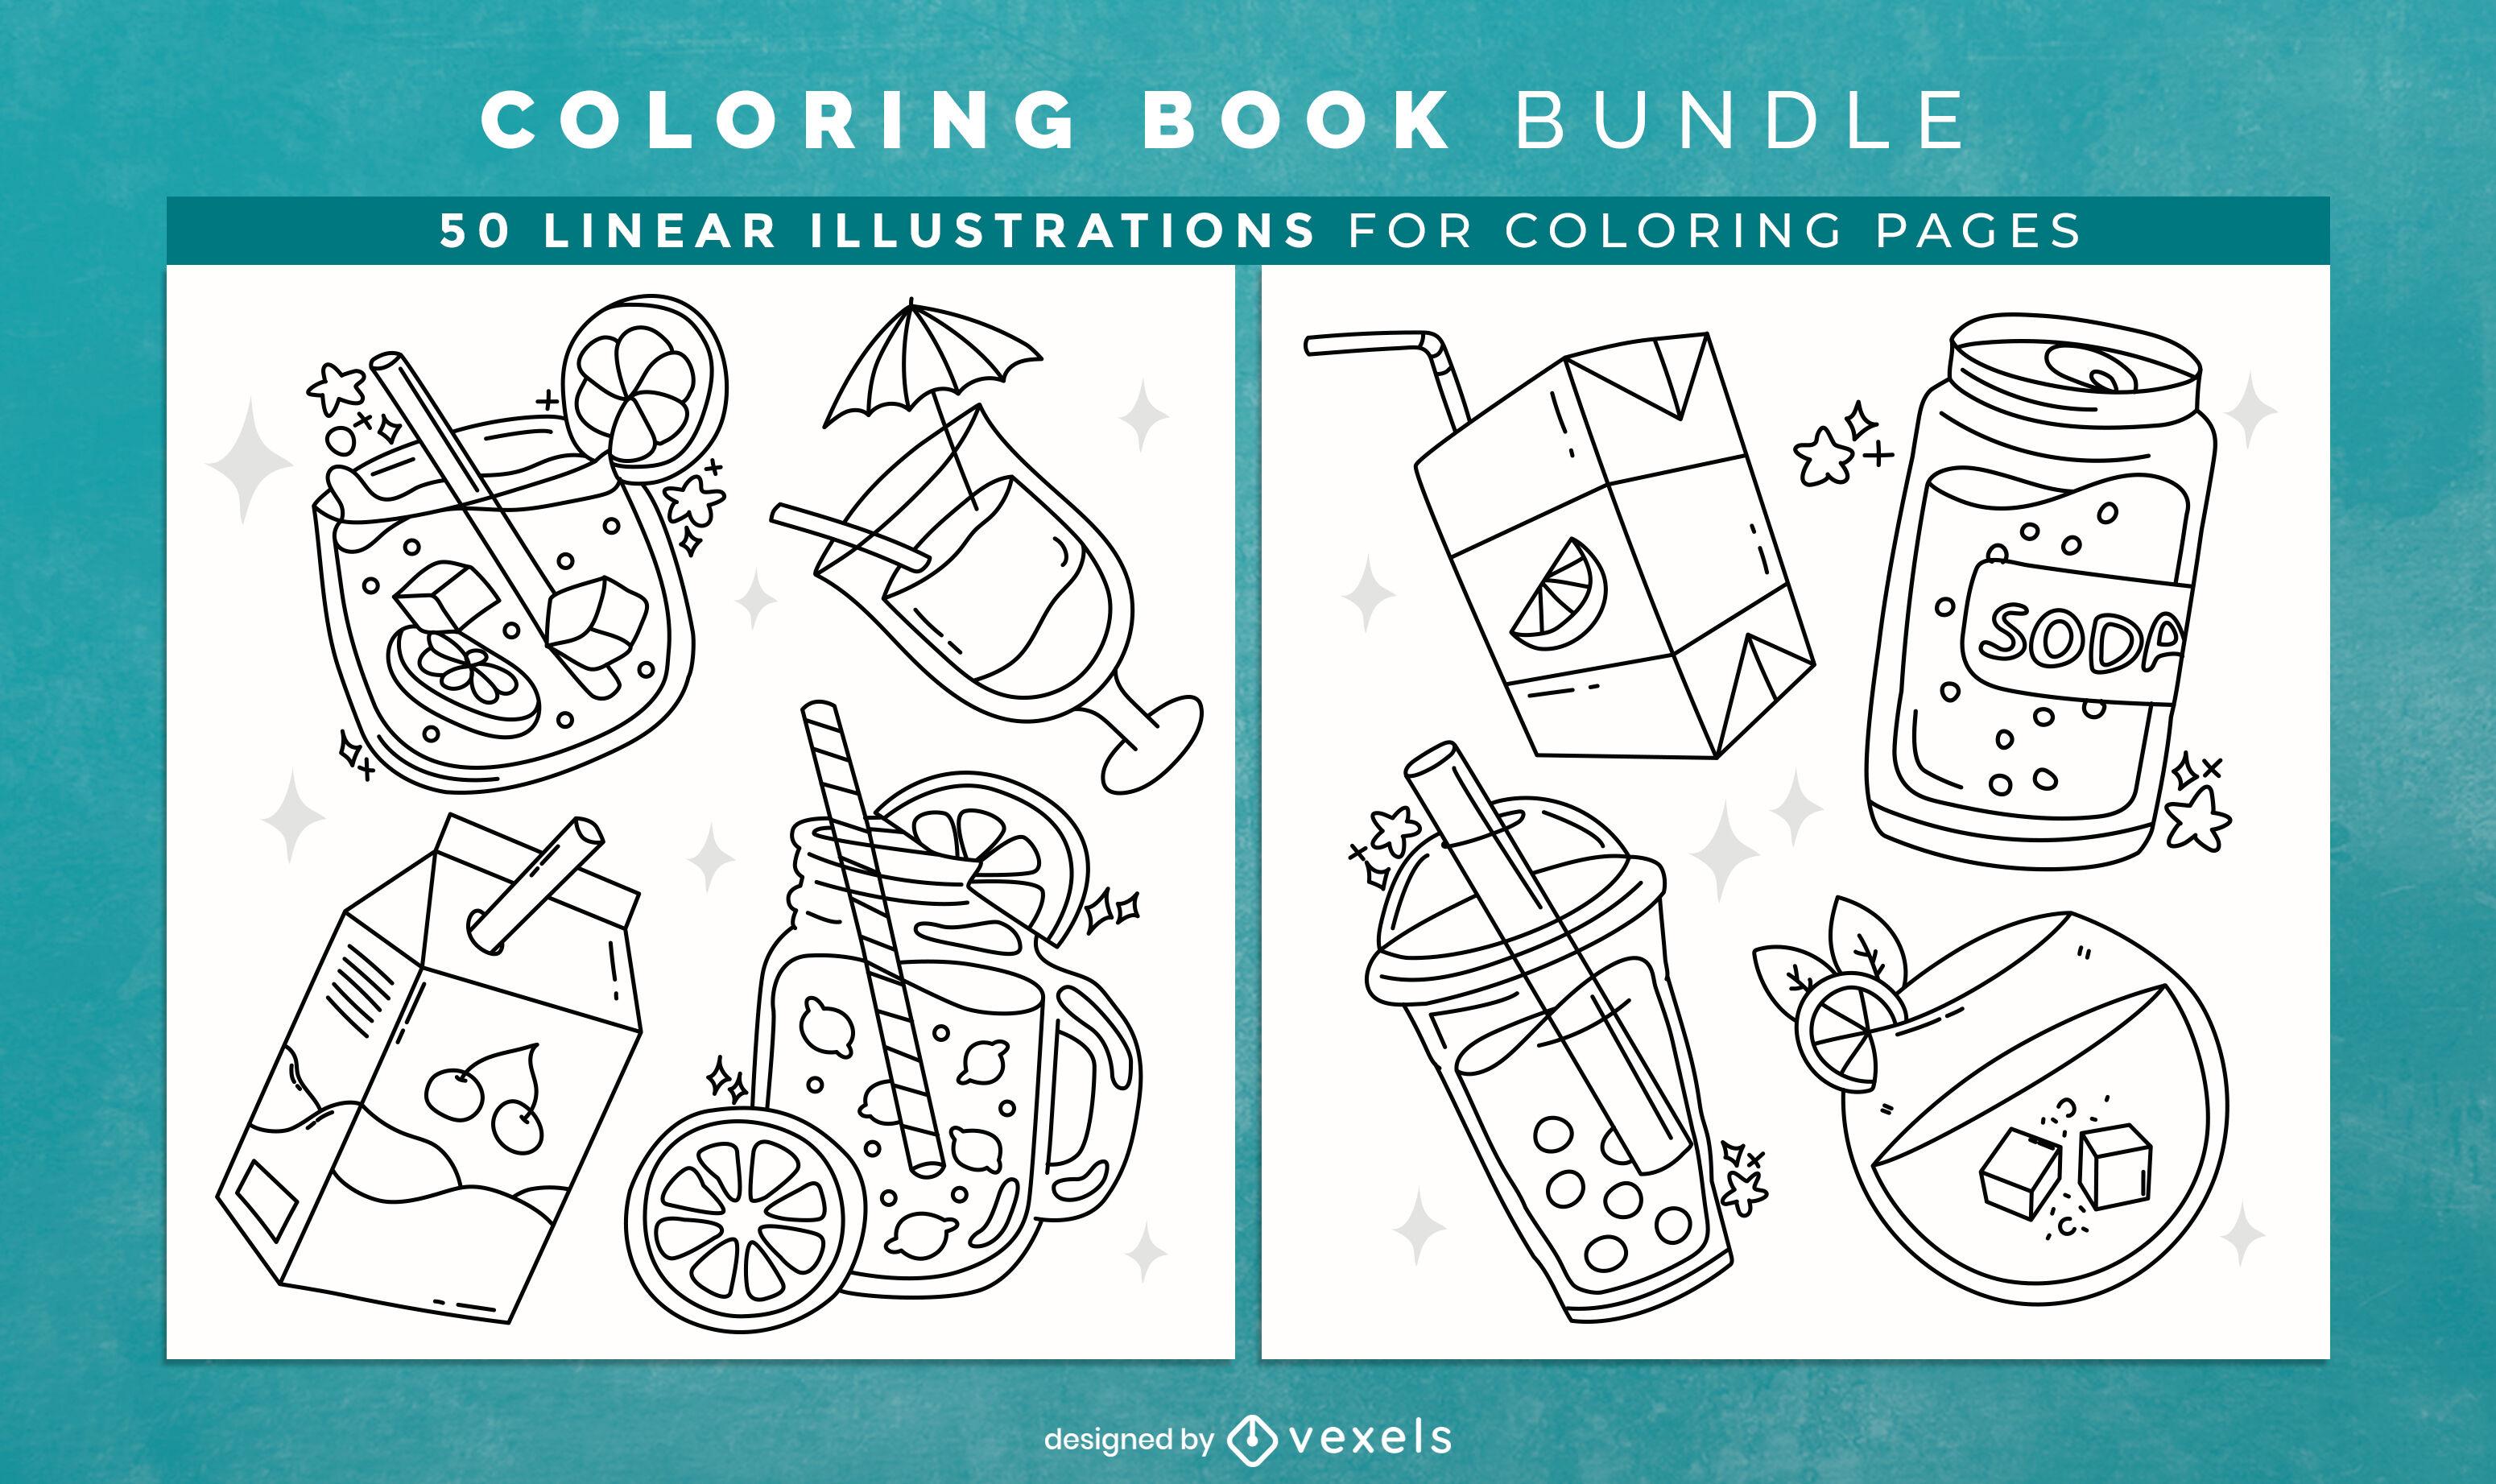 Drinks coloring book interior design